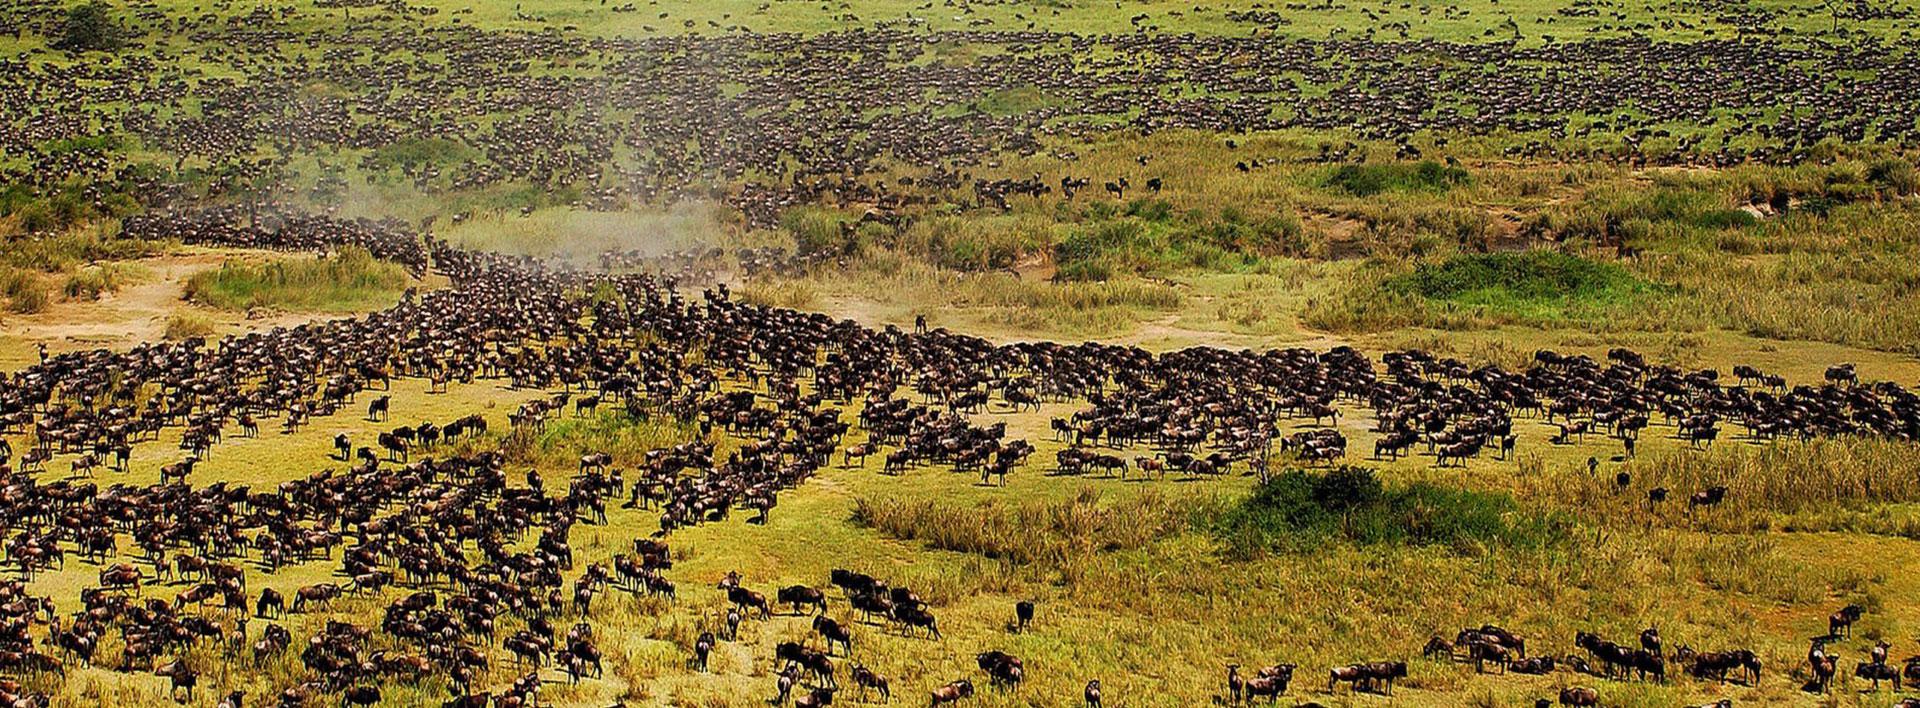 Budget African safari adventure in Tanzania: Big 5 & migration